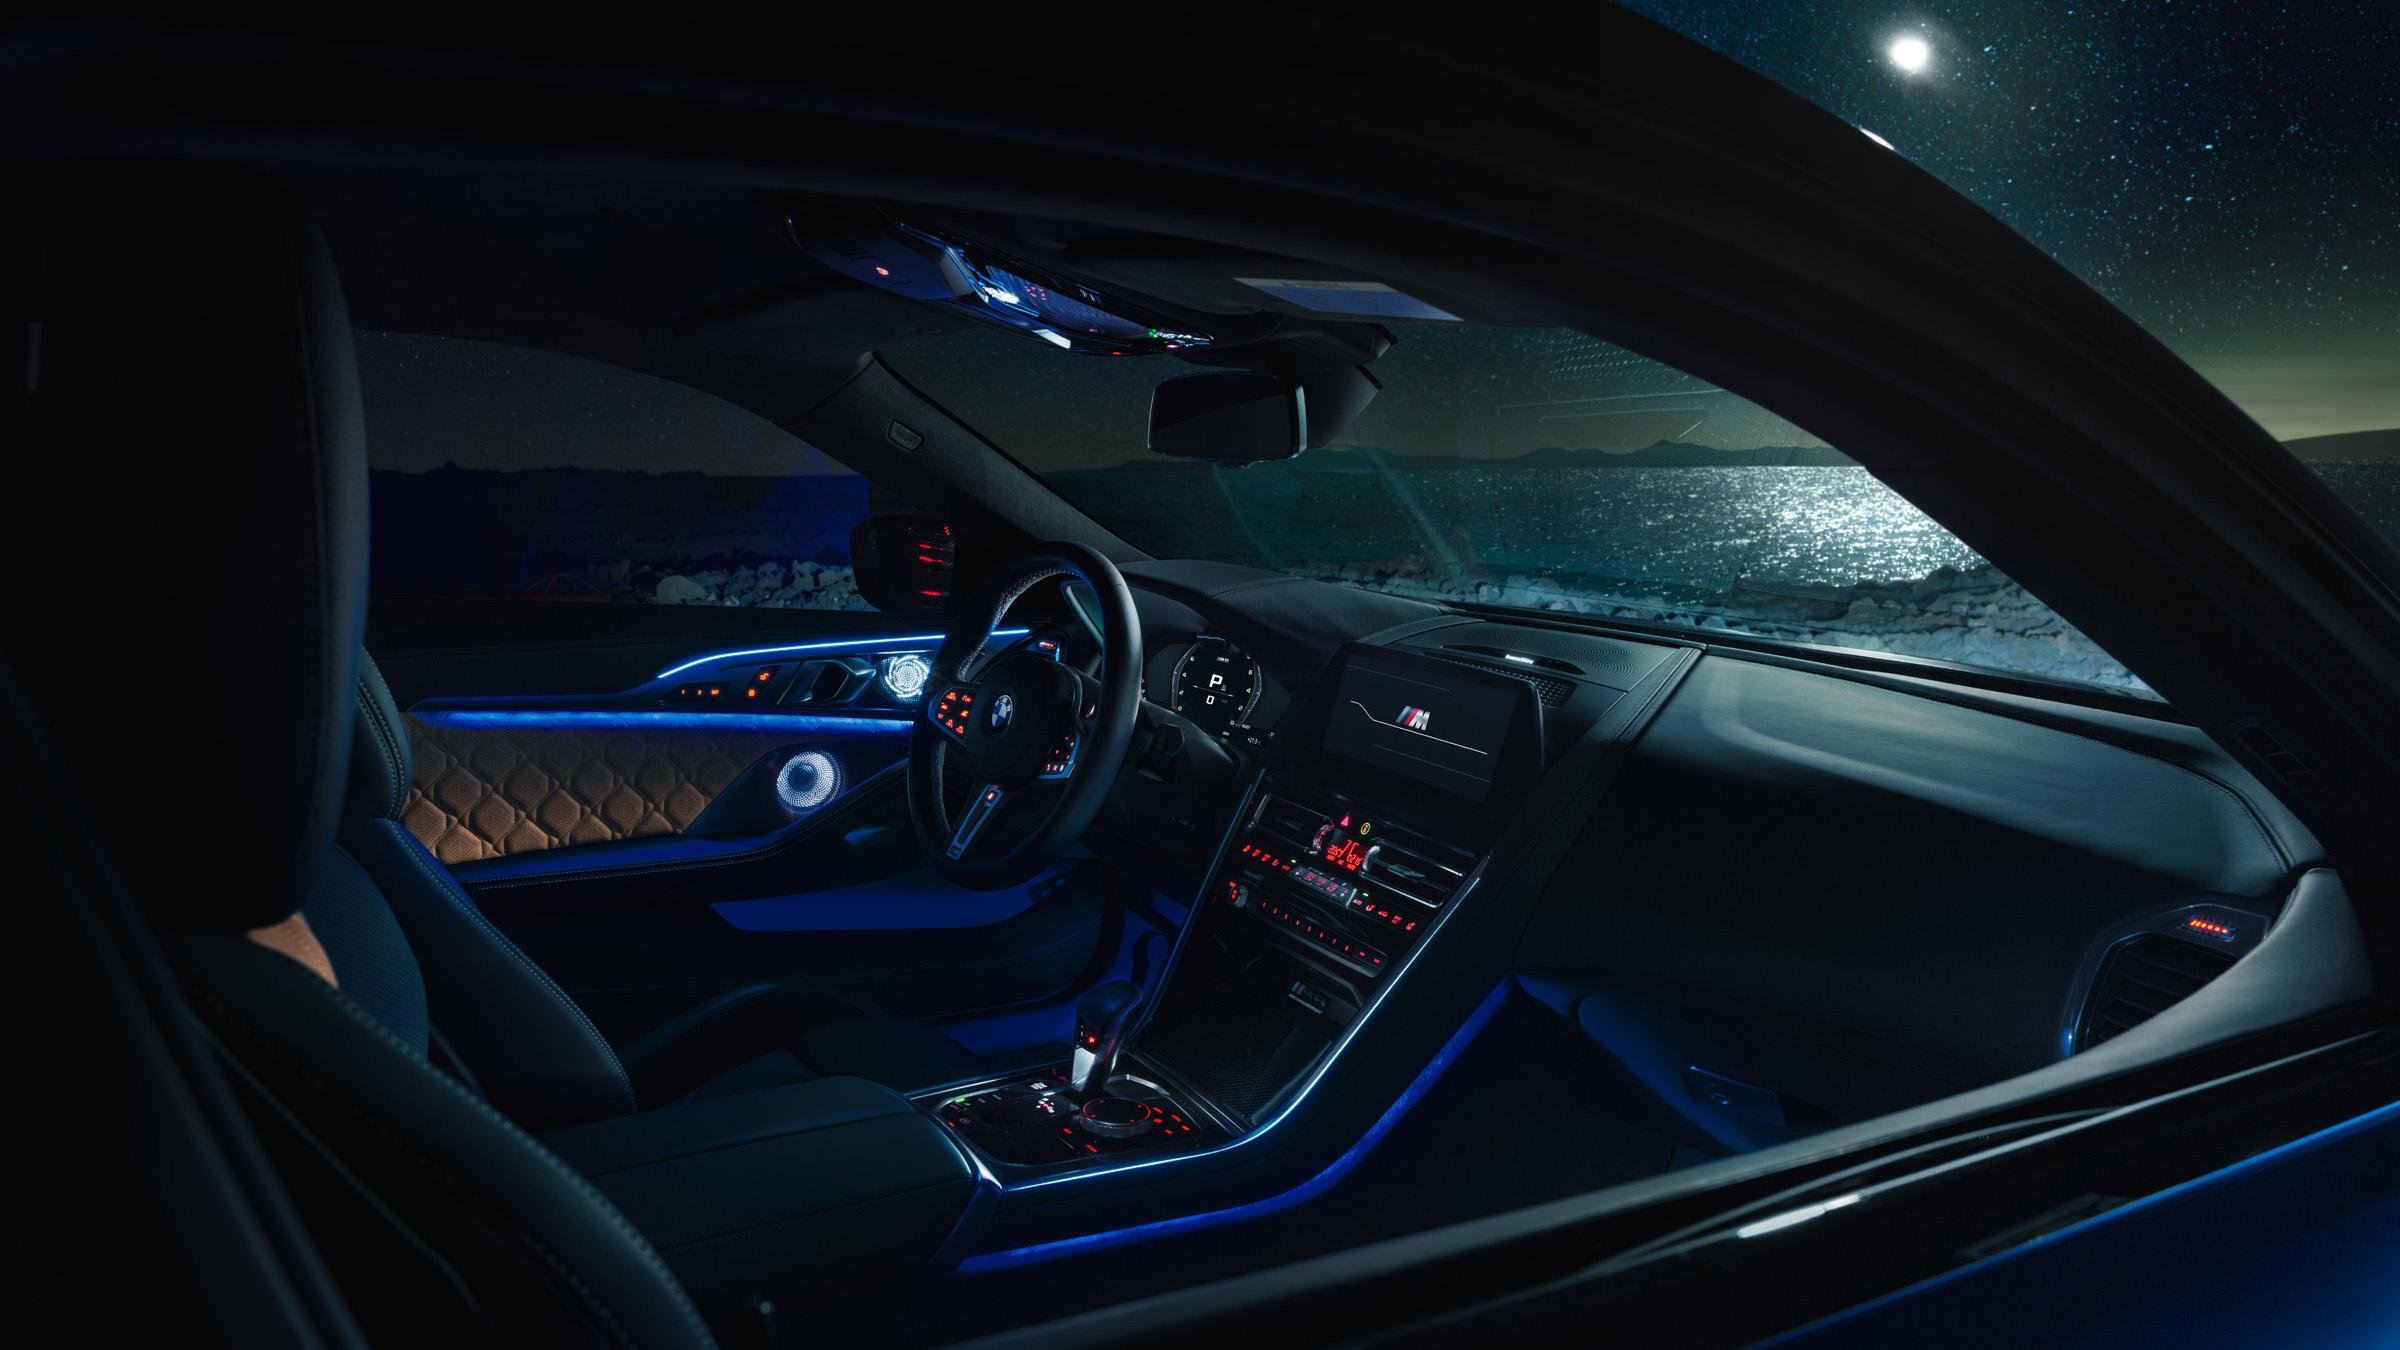 BMW_M8_COUPE_KONRAD_SCHMIDT_02_2400x1350